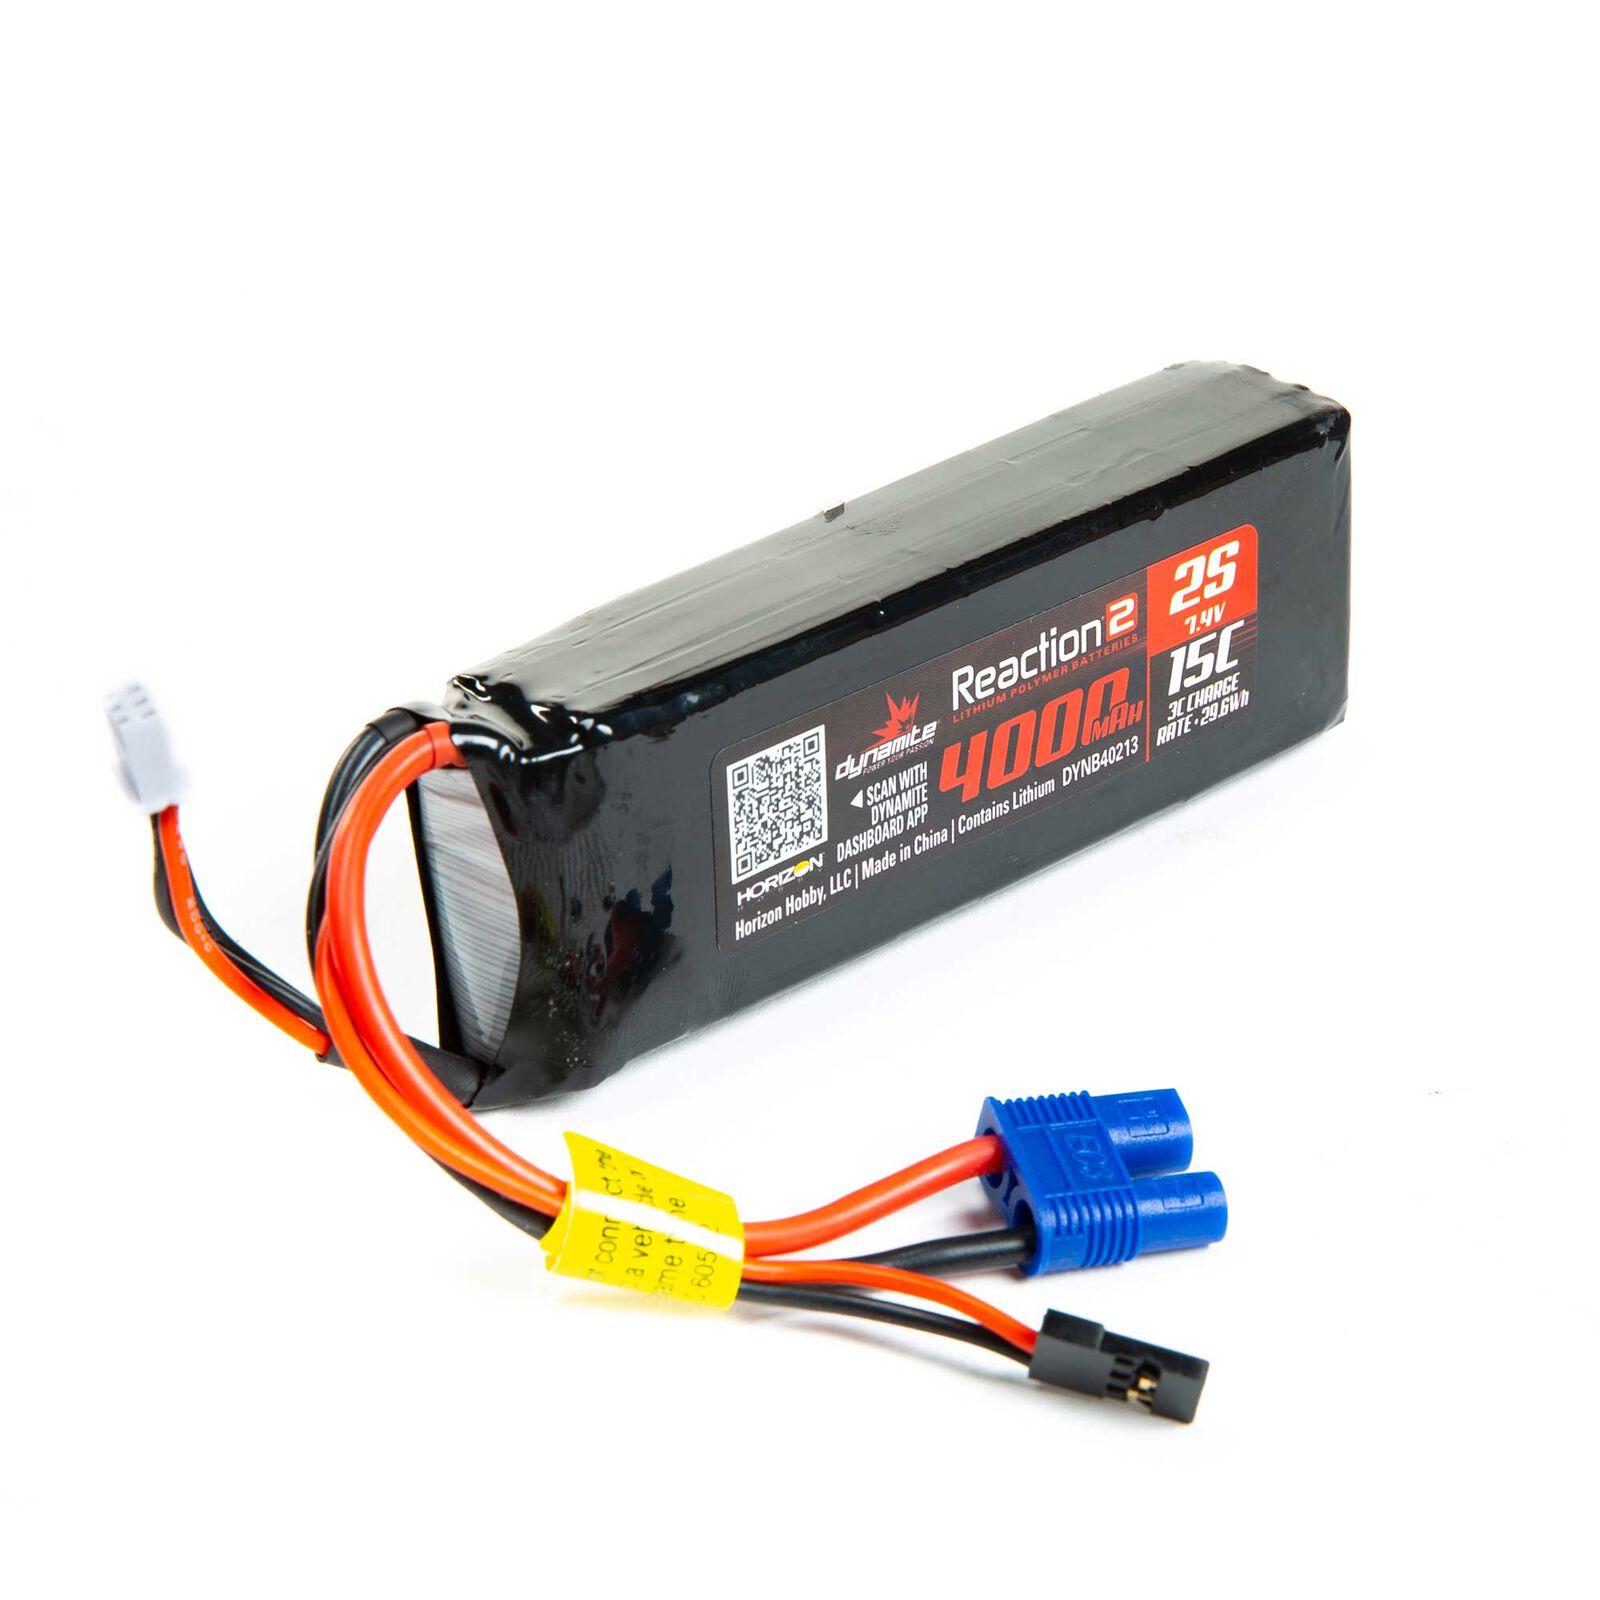 7.4V 4000mAh 2S 15C Reaction 2.0 LiPo Receiver Battery: Universal Receiver, EC3